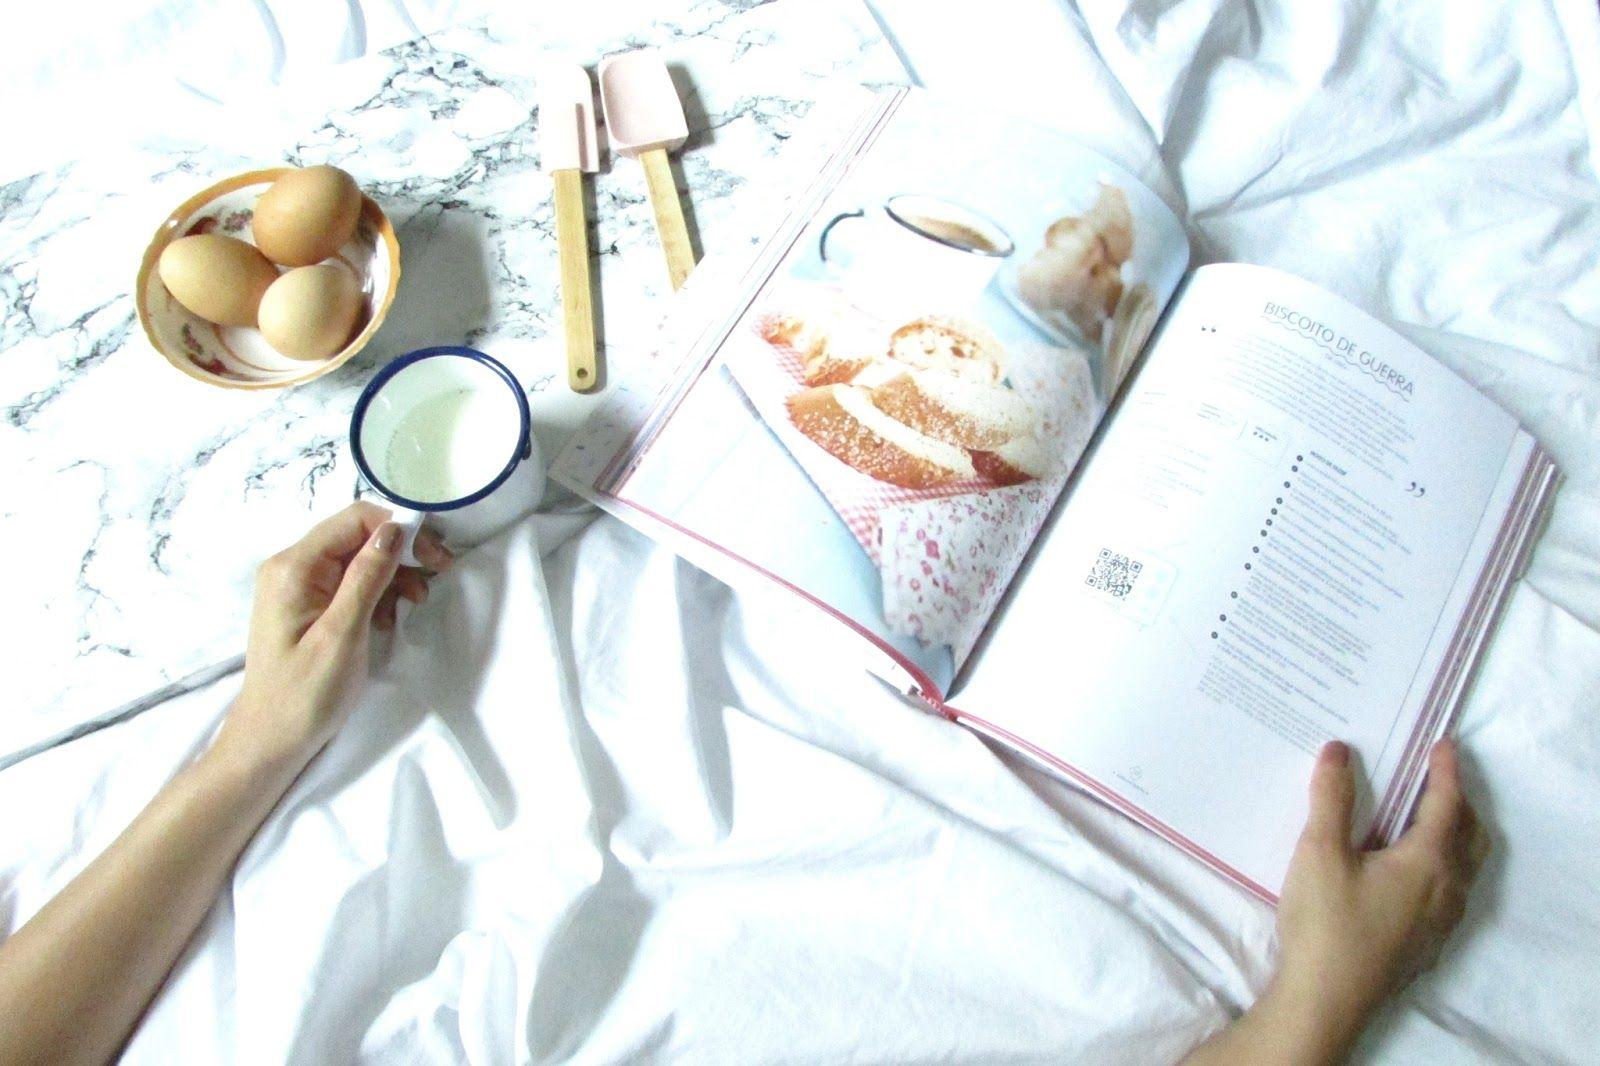 Internet 5 Perfis De Food Stylist Para Seguir Instagram Perfis